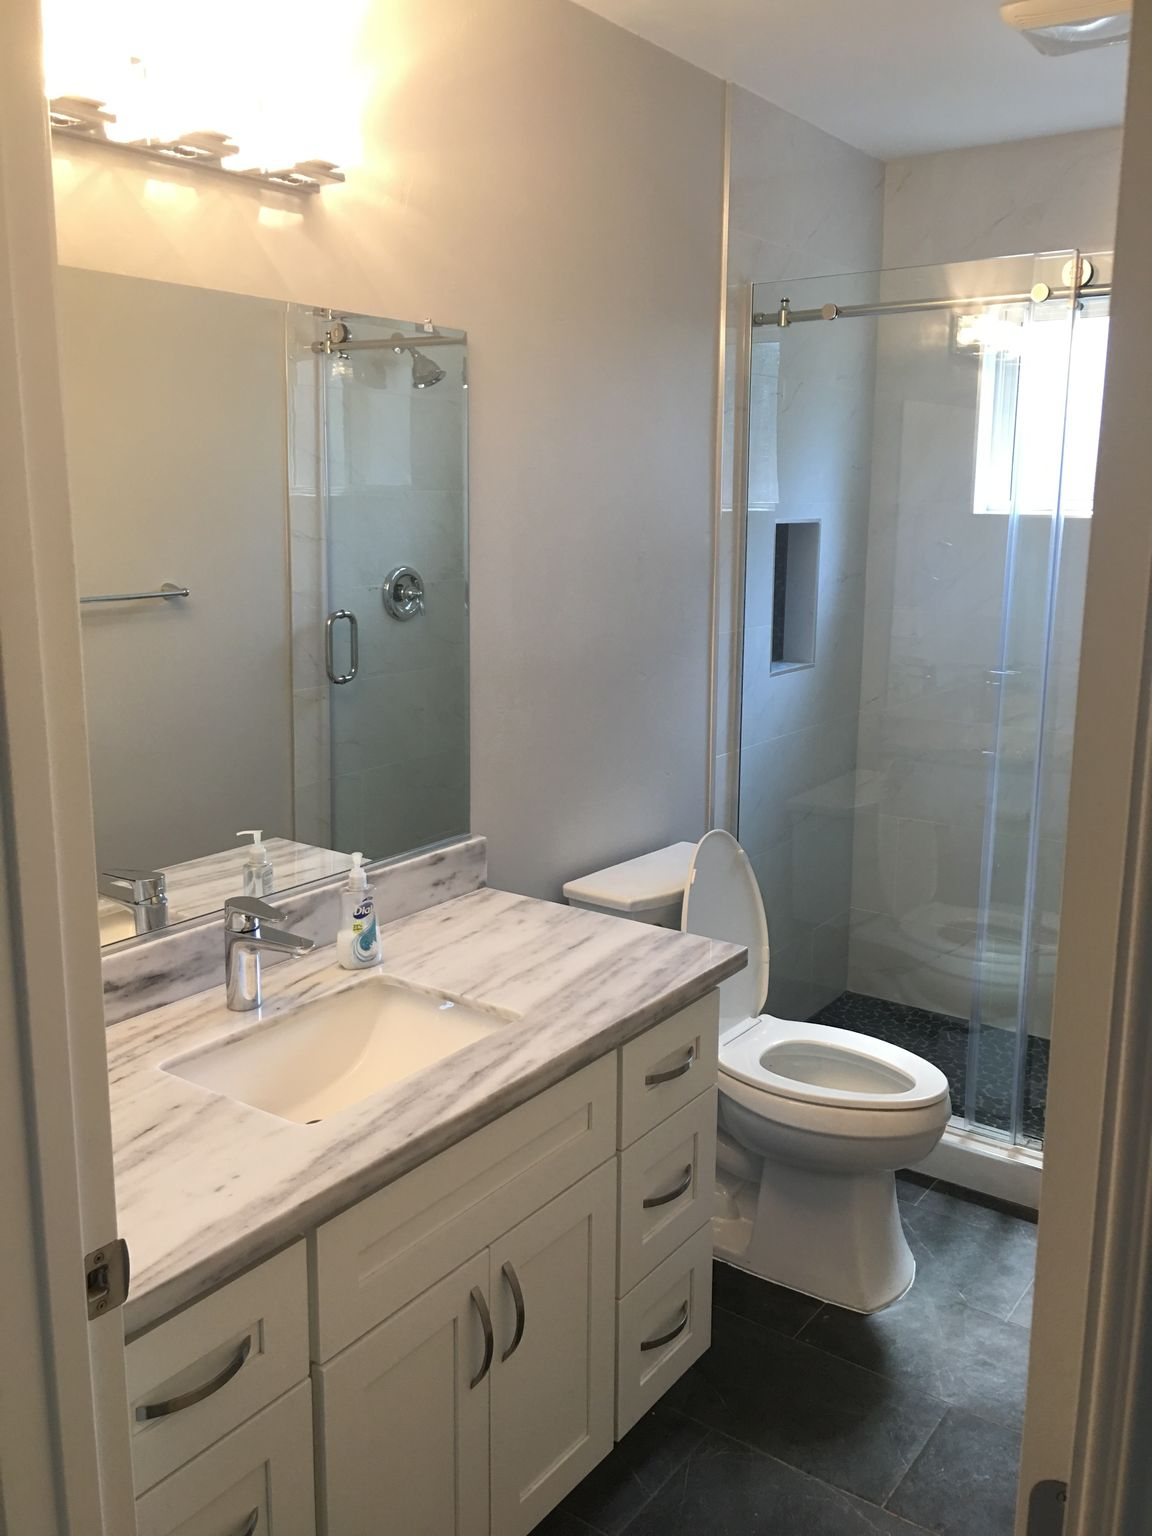 8299 Caribbean Way, Sacramento, CA 95826 - 3 Bed, 2 Bath